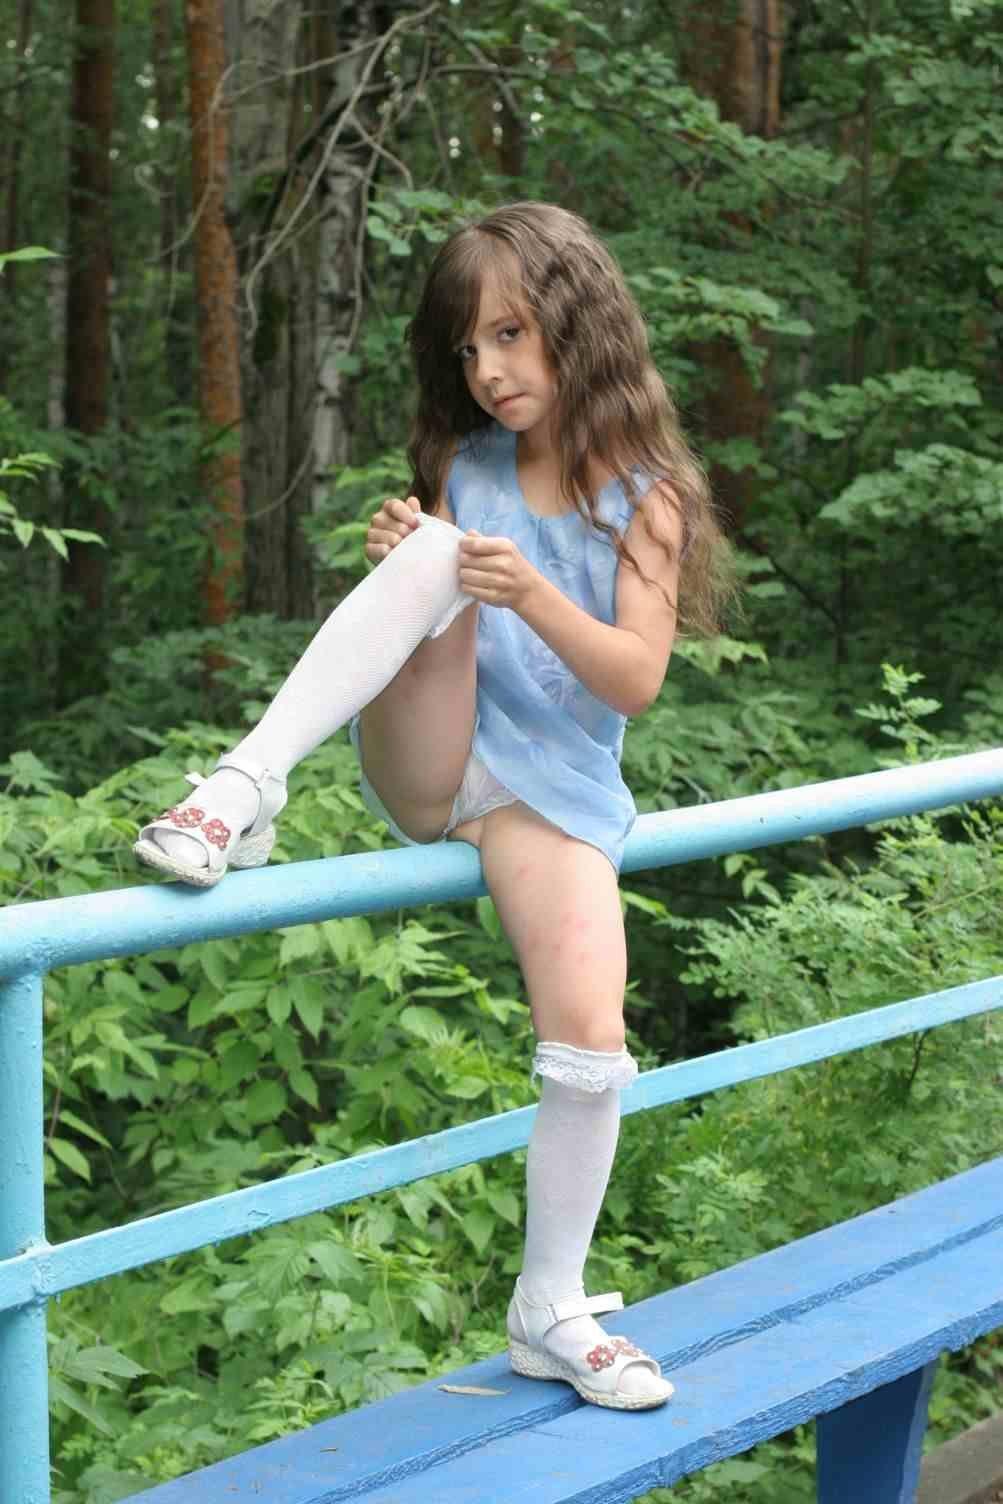 Girl Model Sarah